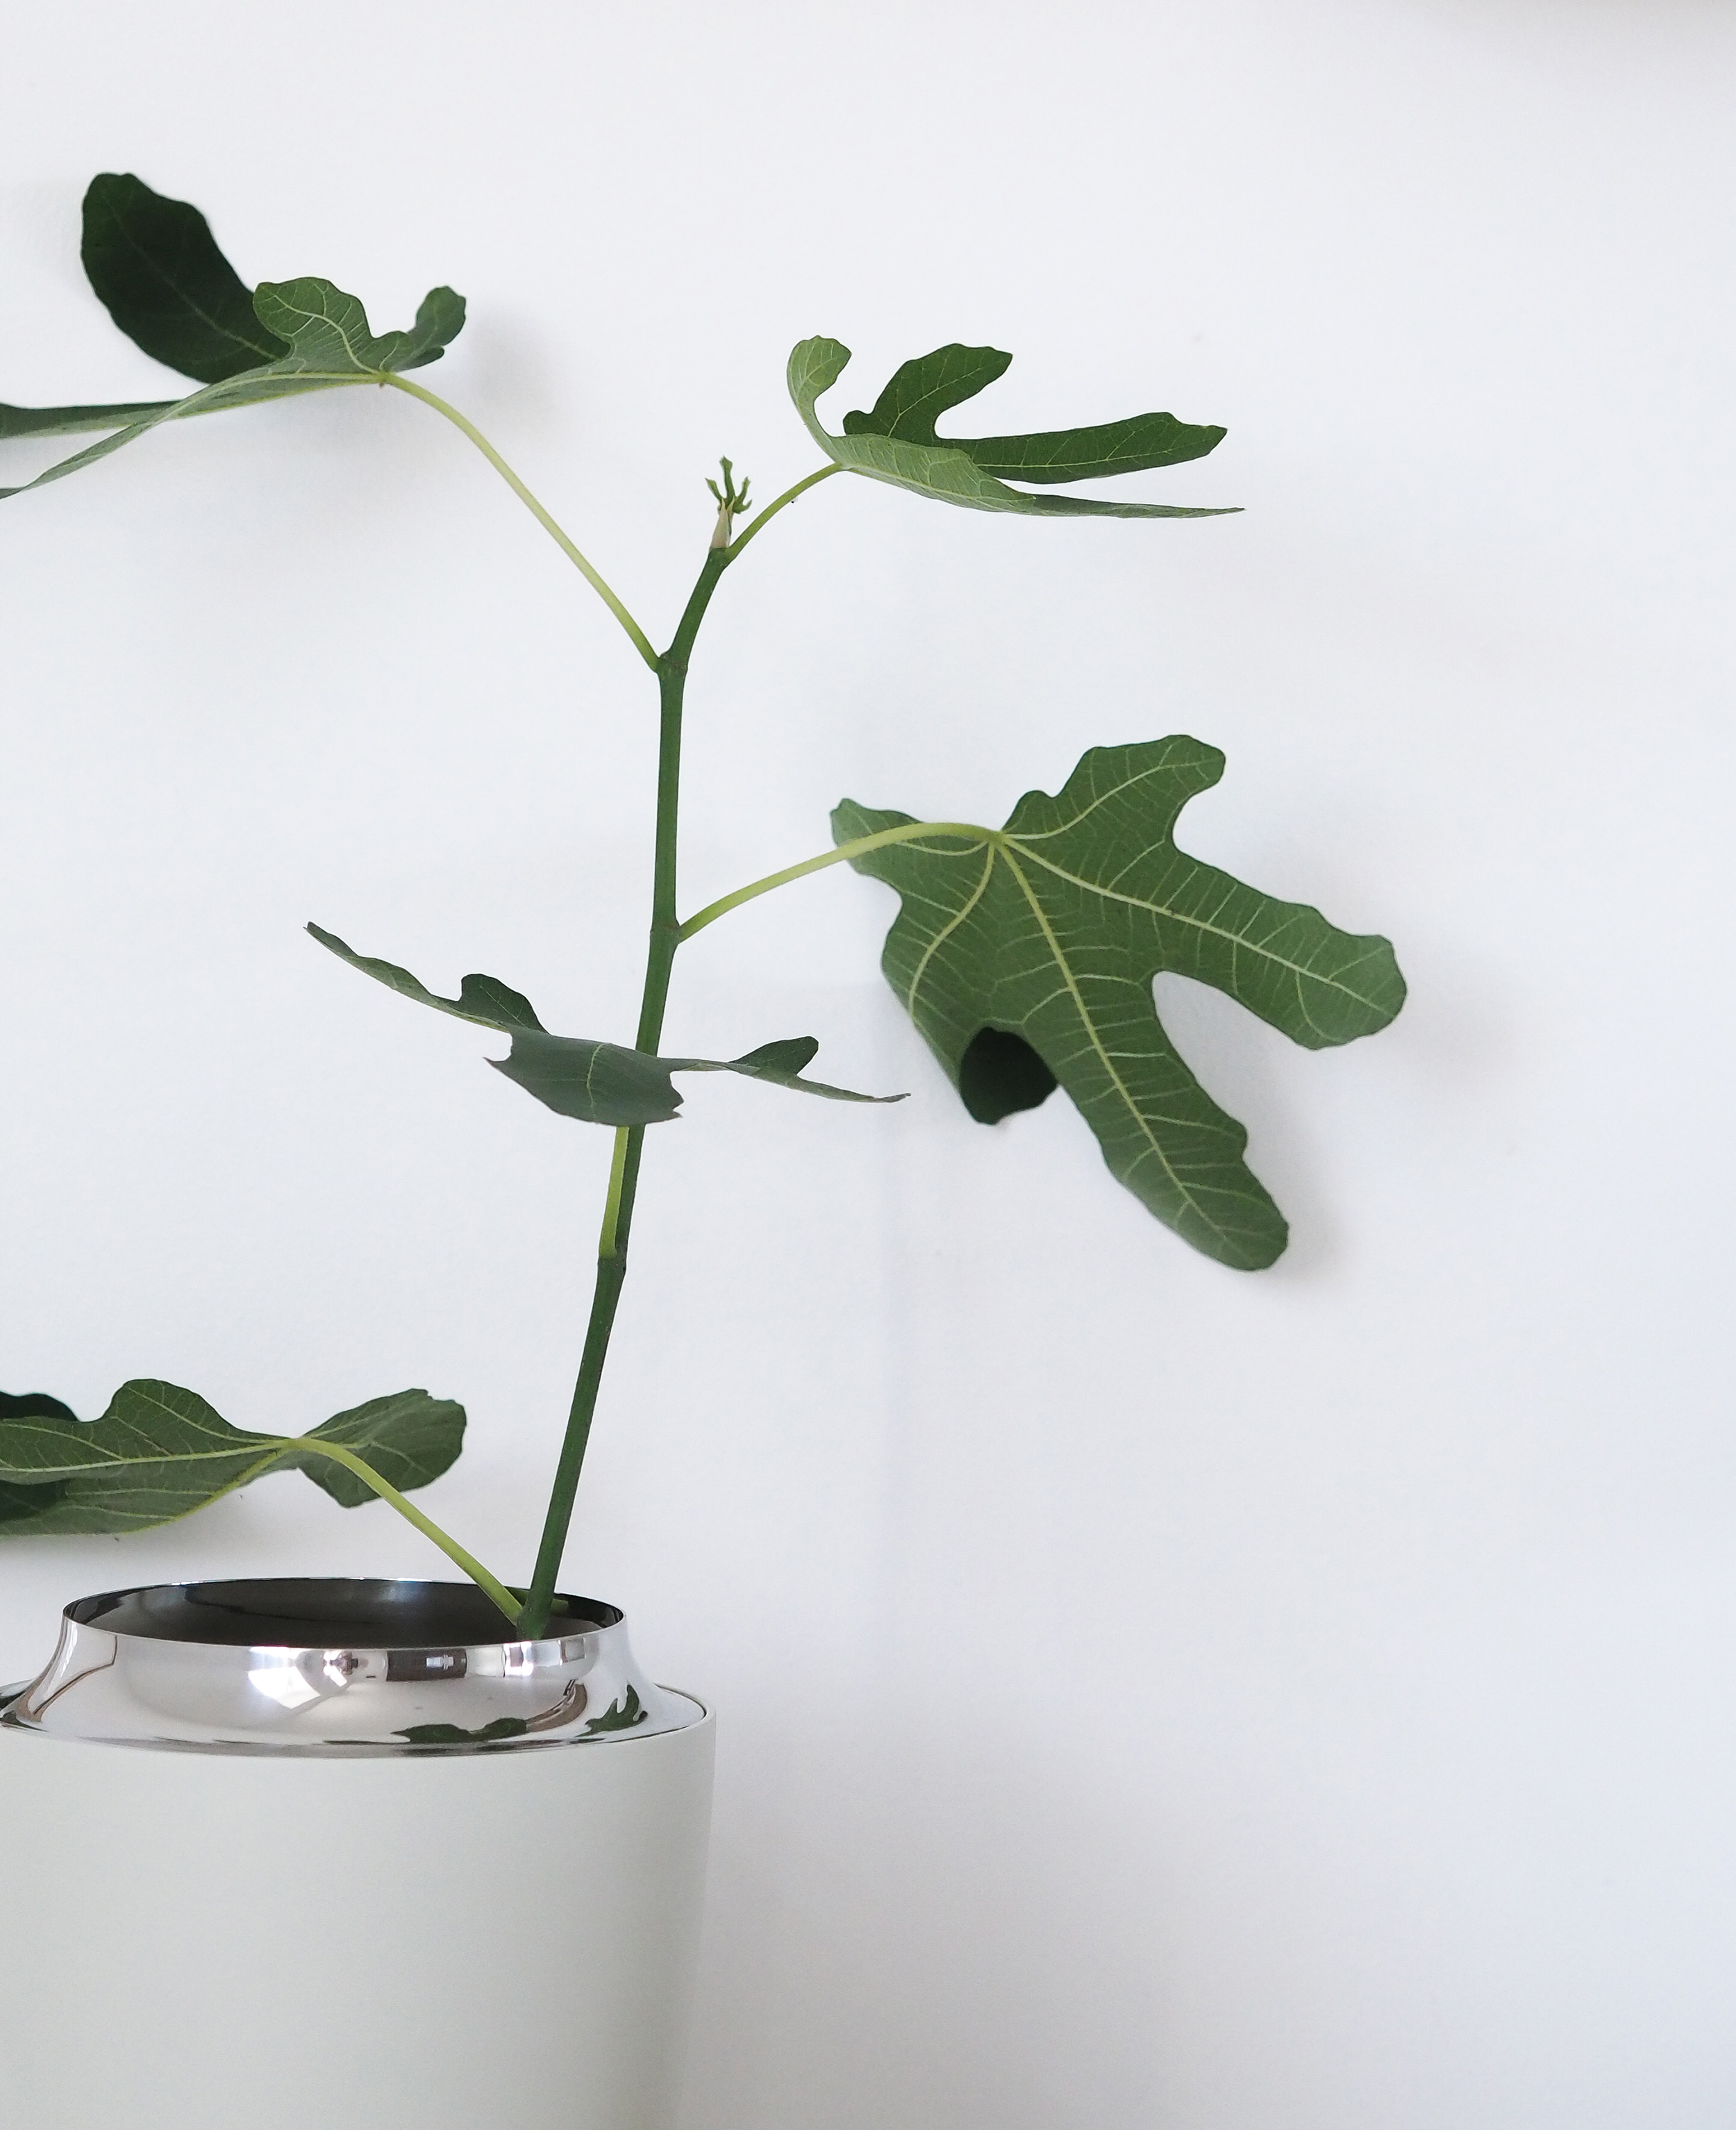 A fresh new start, Moving to Copenhagen. New fig tree